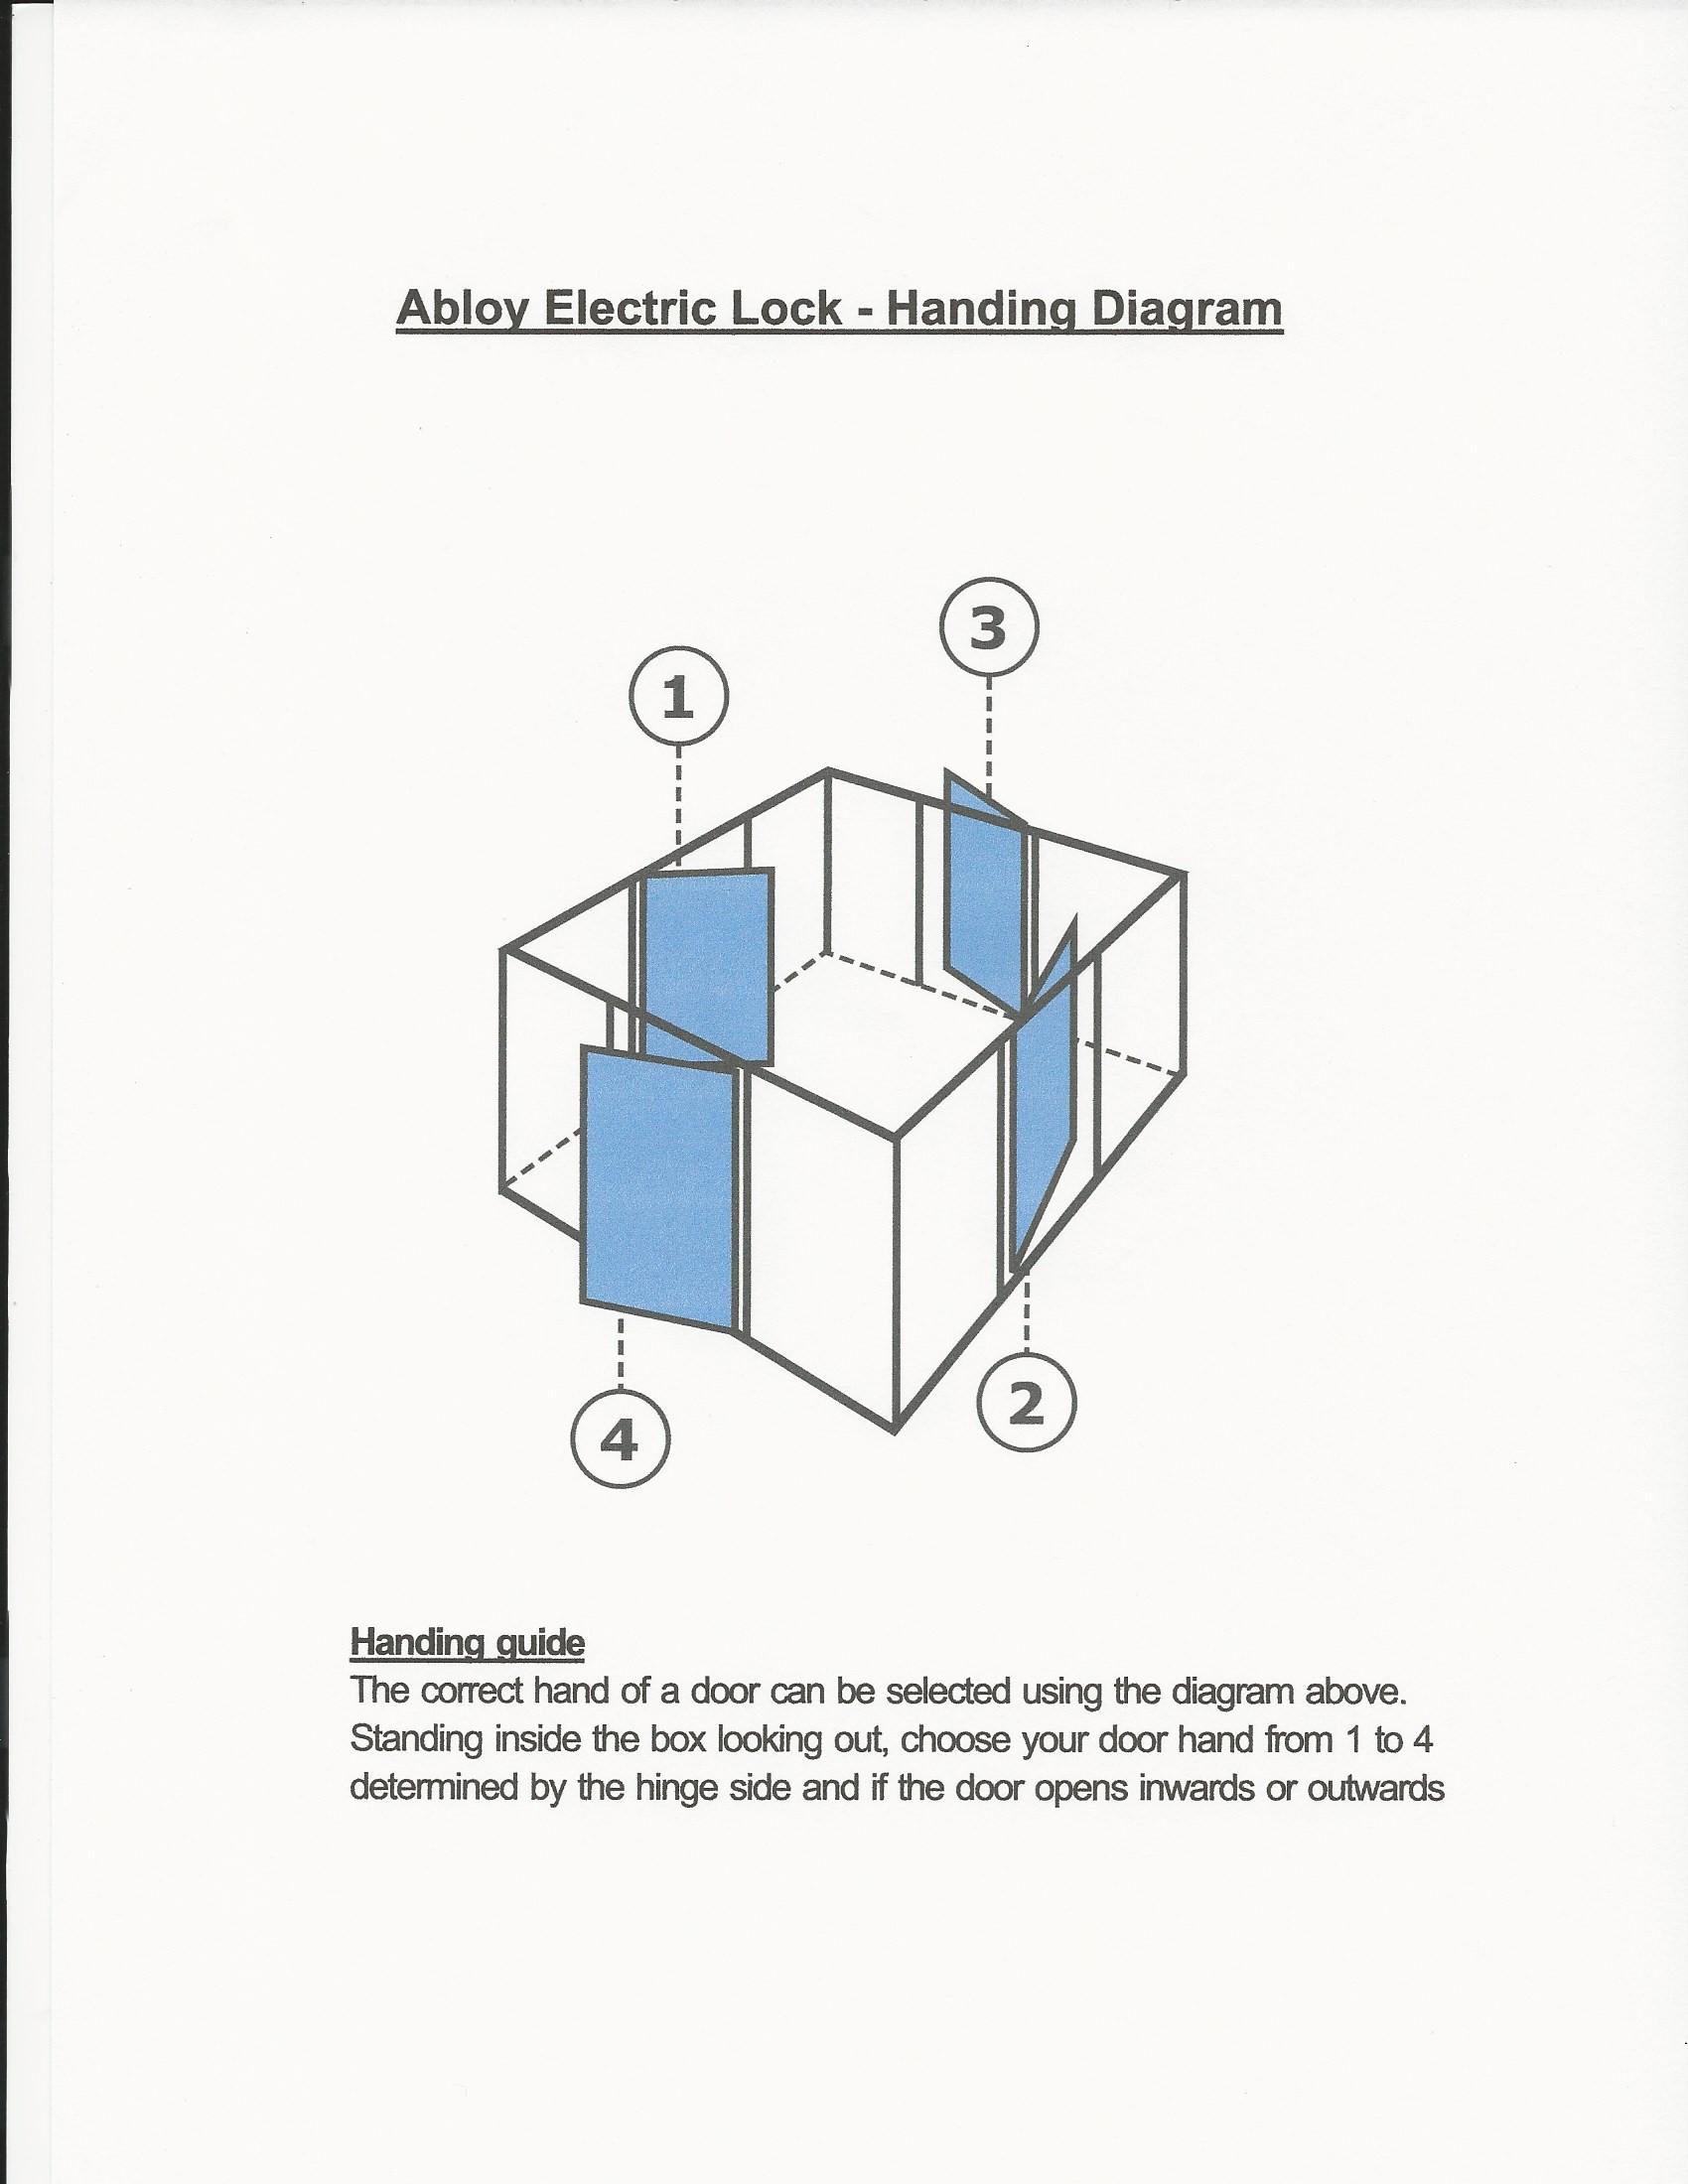 Abloy Lock Diagram Assa Locks Wire Diagrams A Wiring El411 Electric Solenoid Locking Systems 32